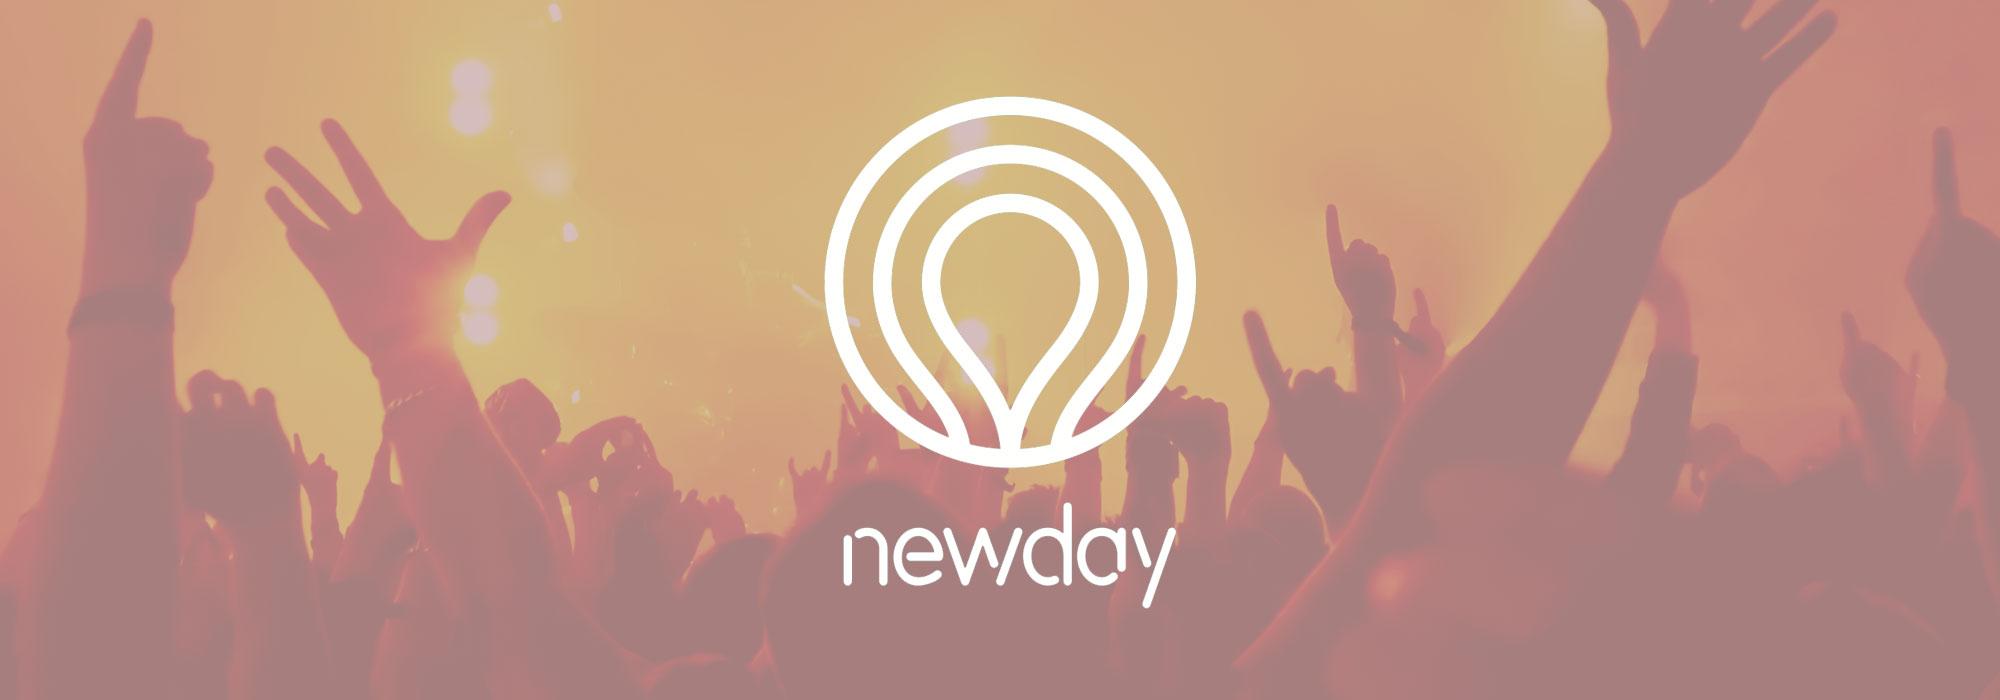 Newday 2019 logo